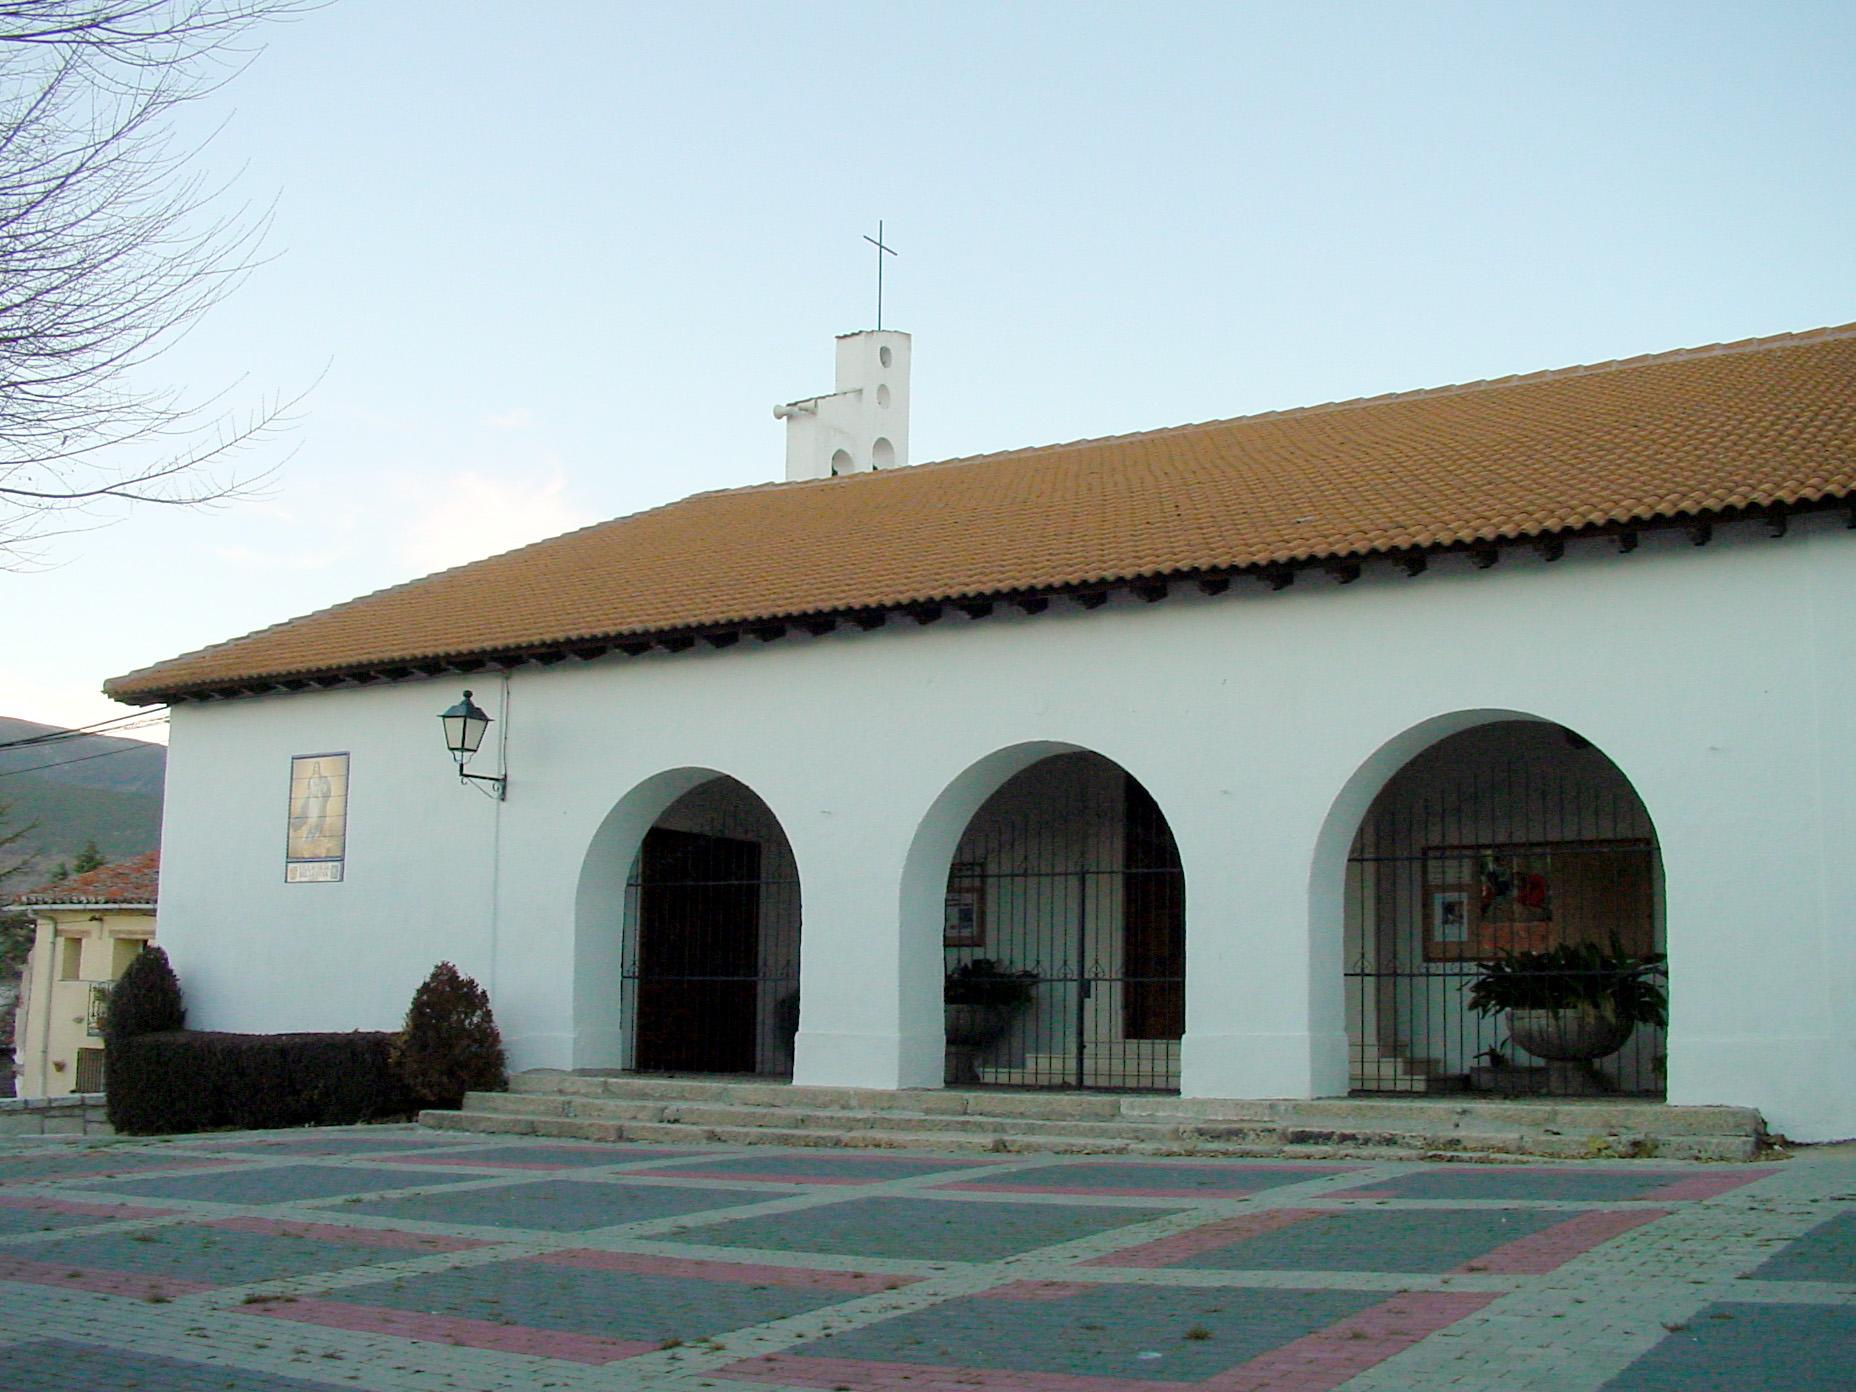 Lateral de iglesia en Villavieja del Lozoya